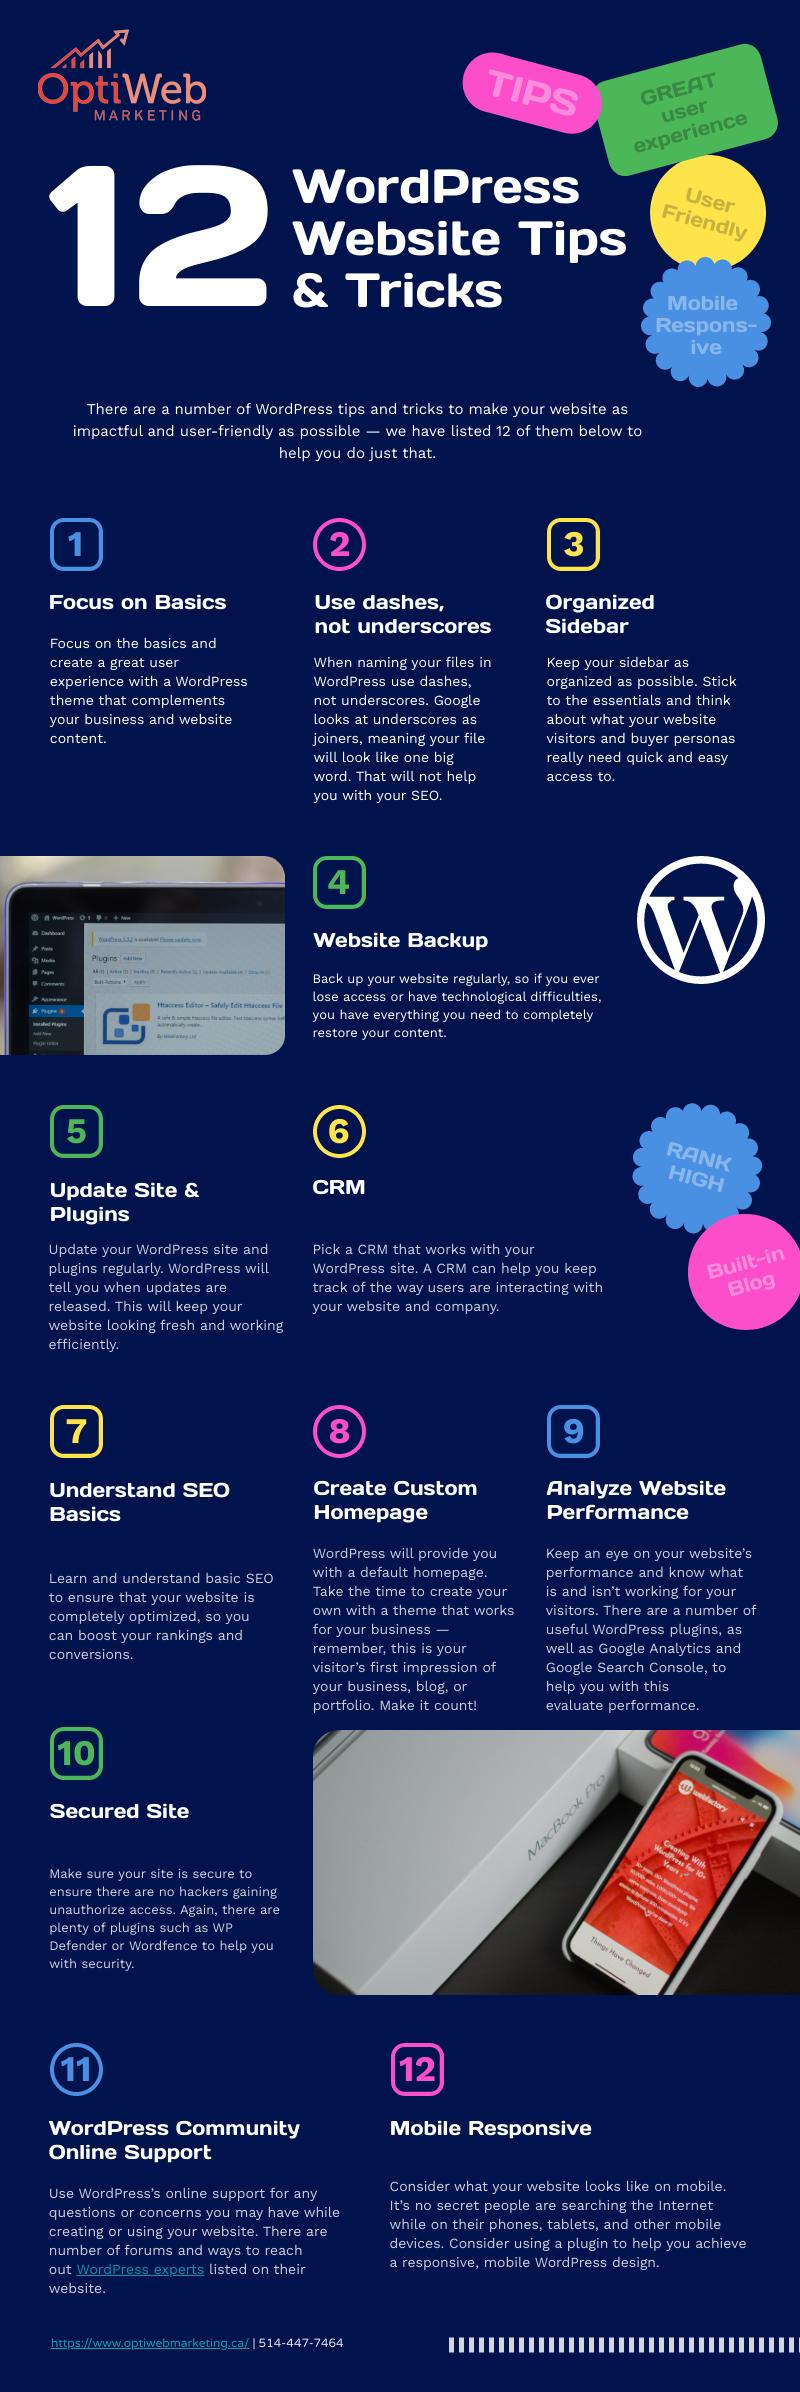 WordPress Website Tips & Tricks 2021